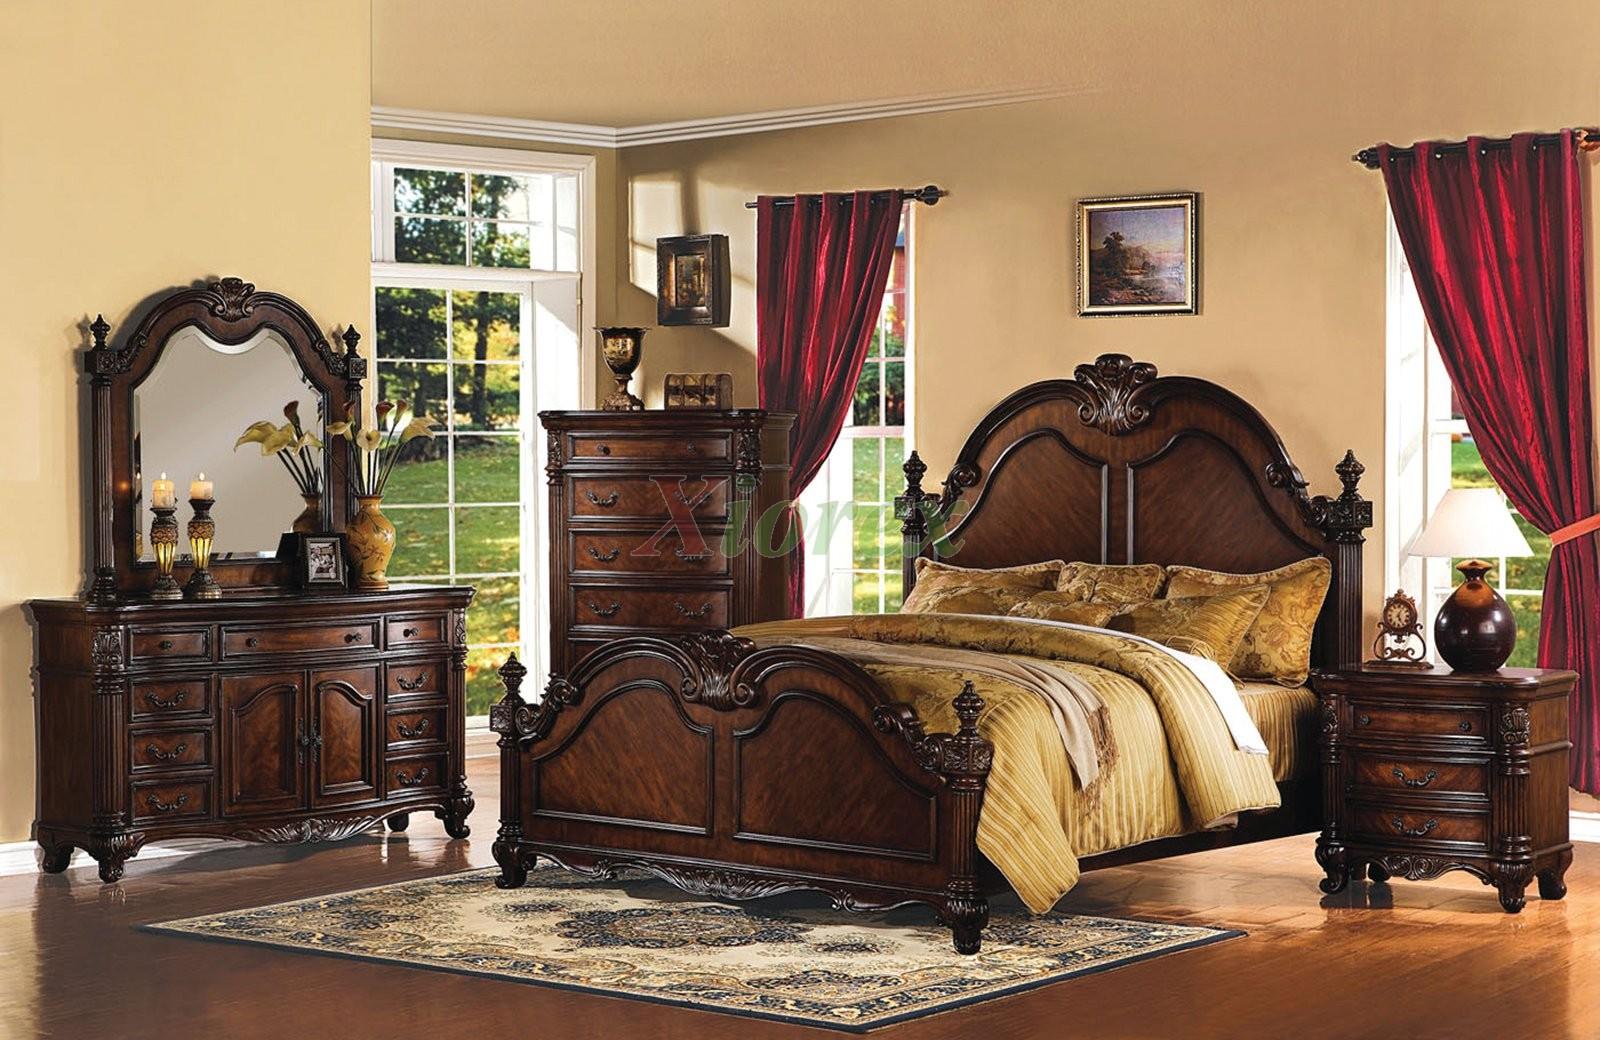 poster bedroom furniture set 117 xiorex poster bedroom furniture set